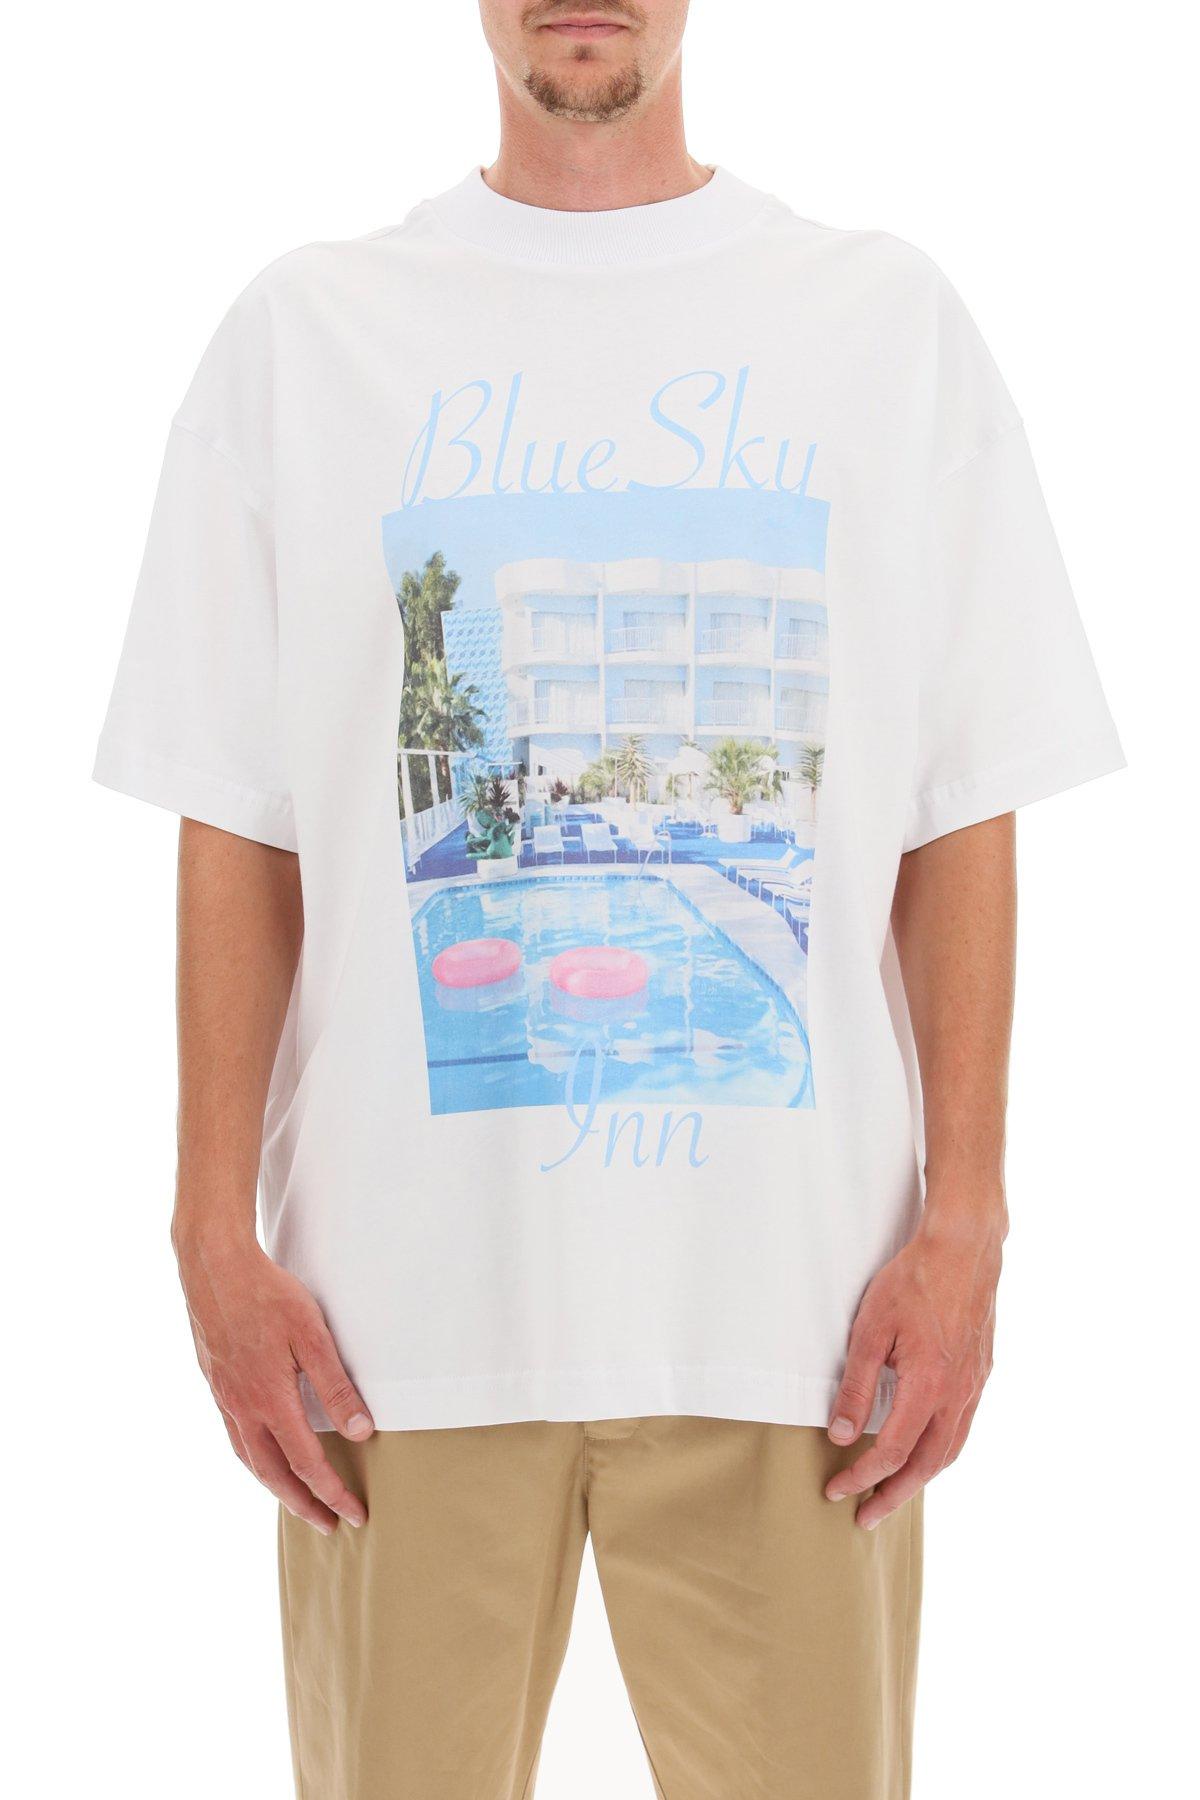 Blue sky inn t-shirt pool